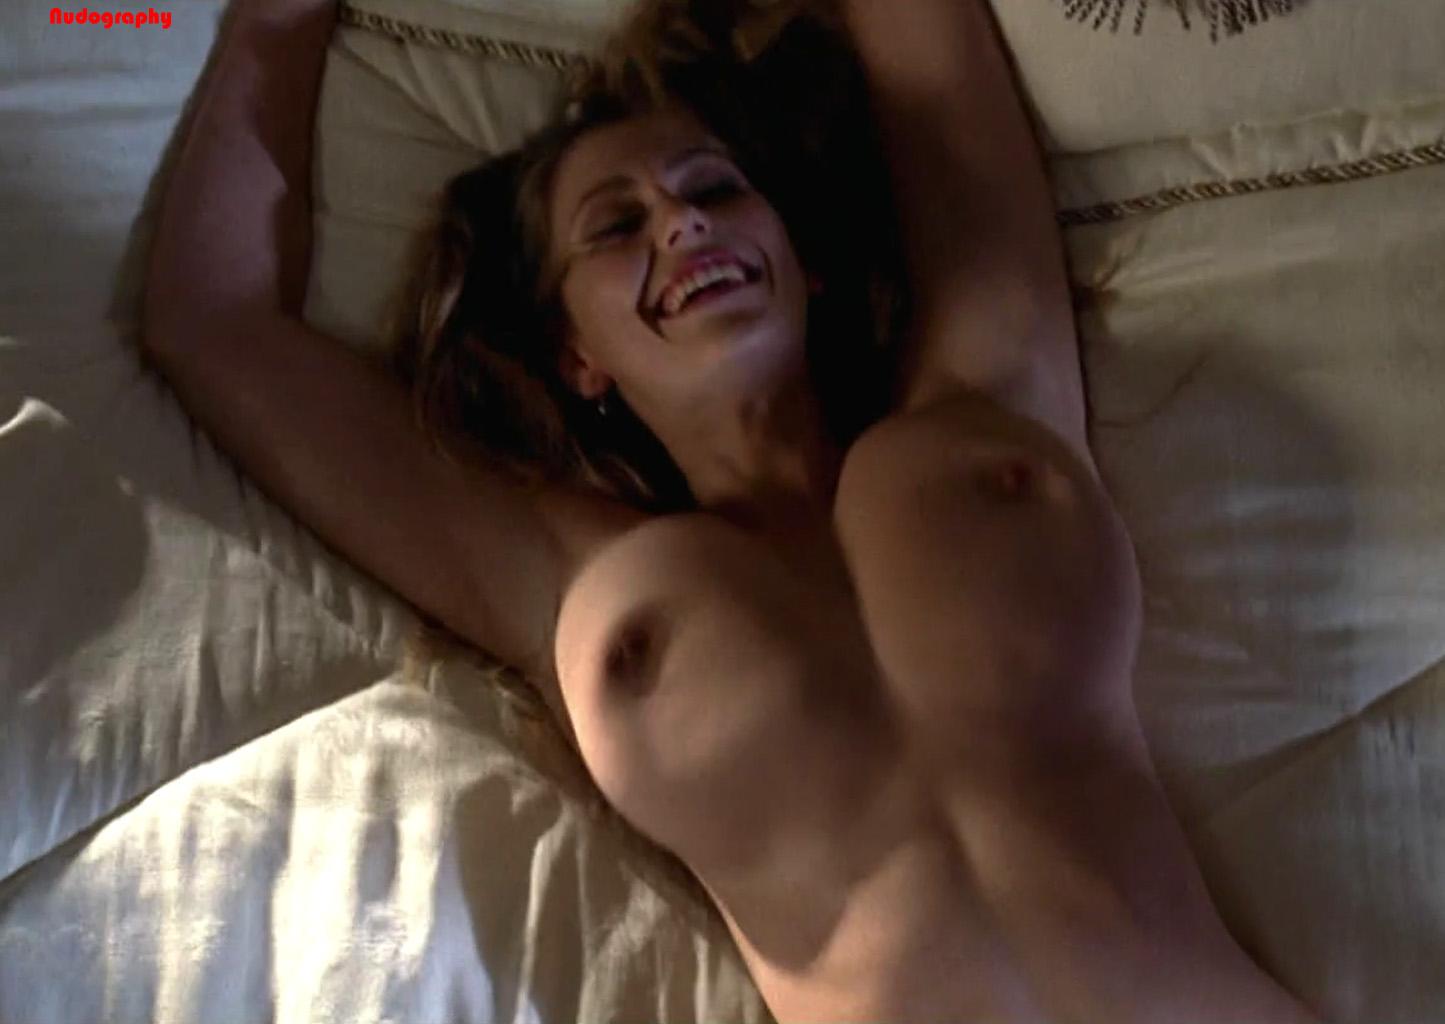 Diora baird playboy nude porn cum anal, free naked sex games